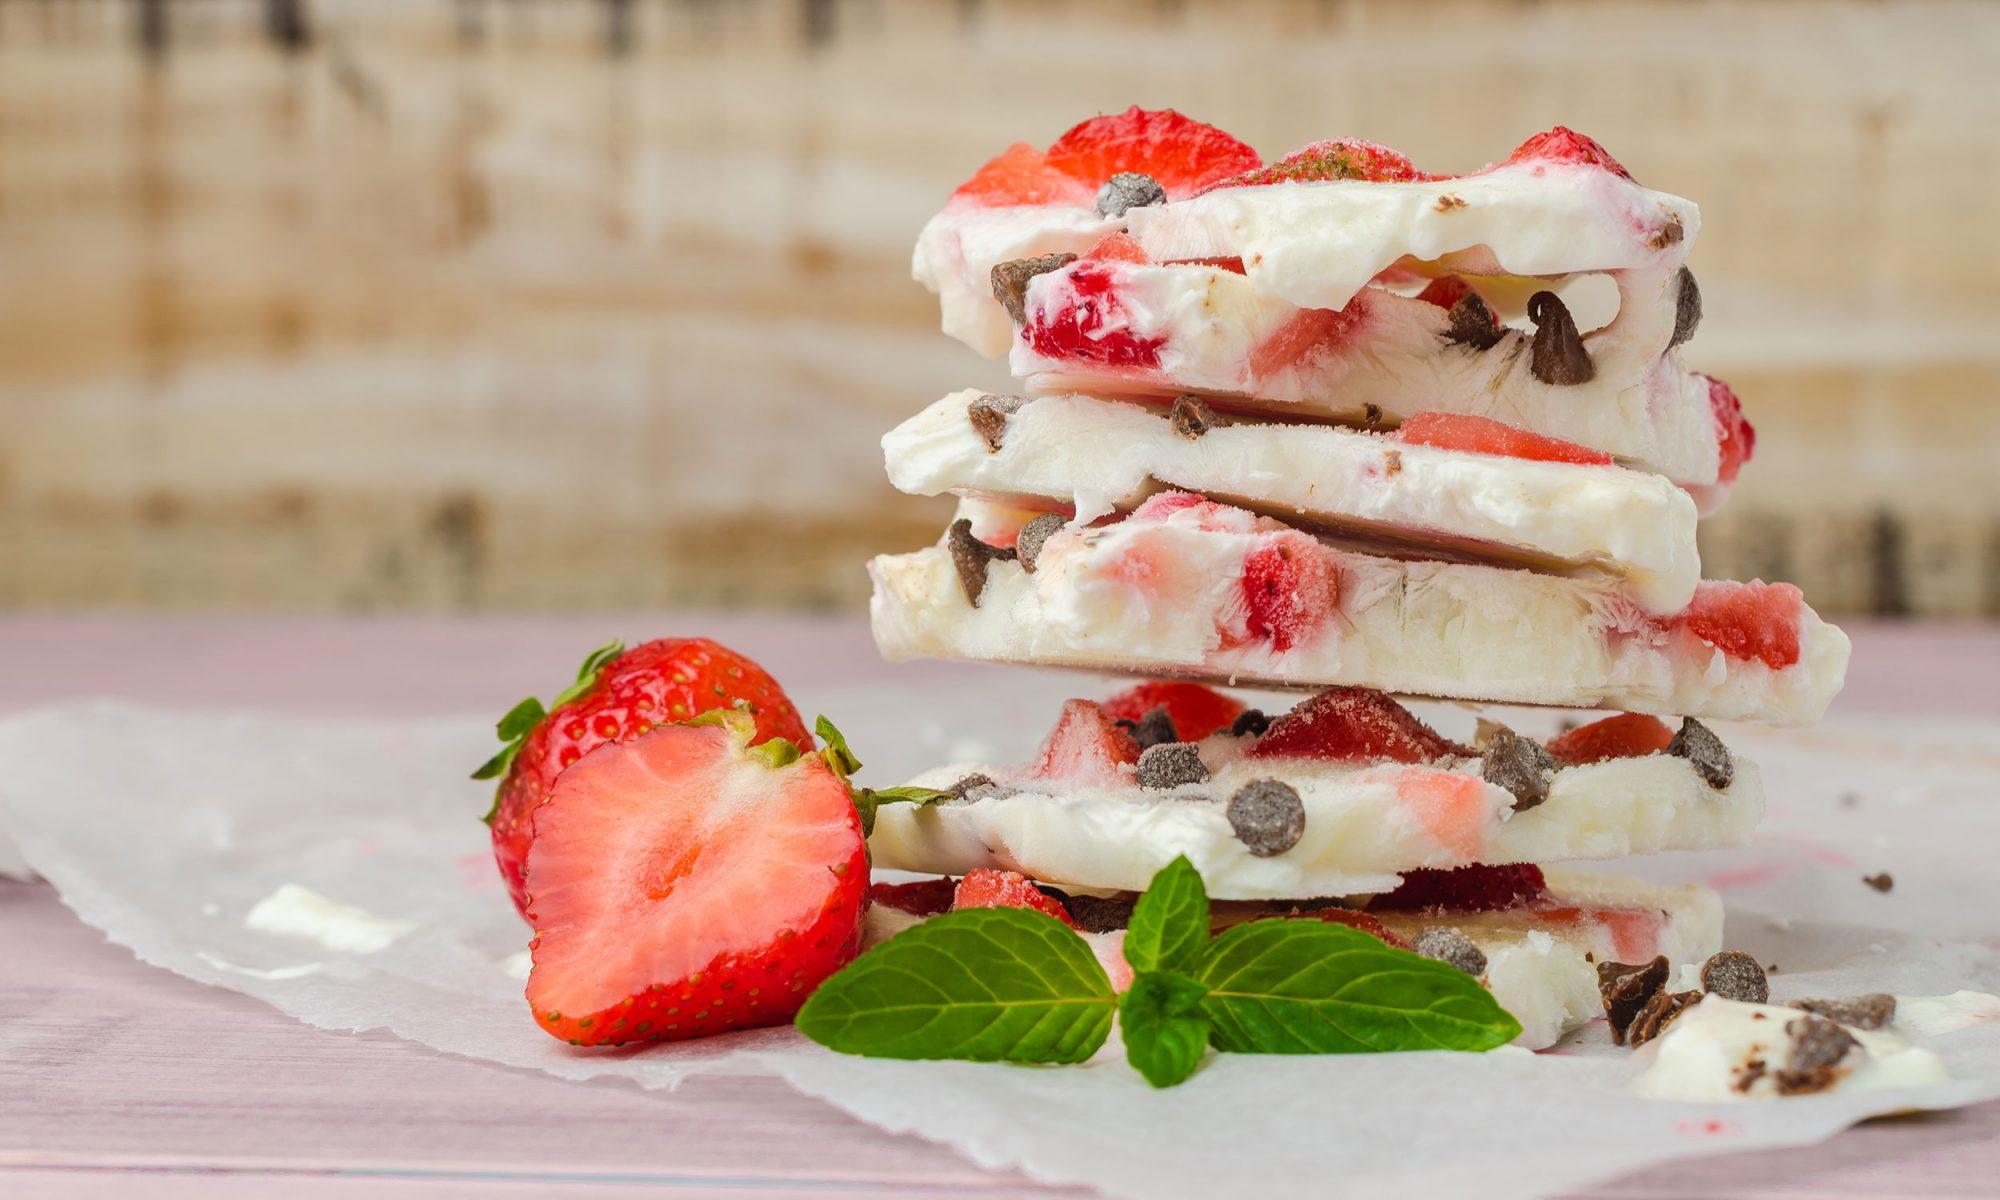 Yogurt bark with chocolate, strawberries and mint